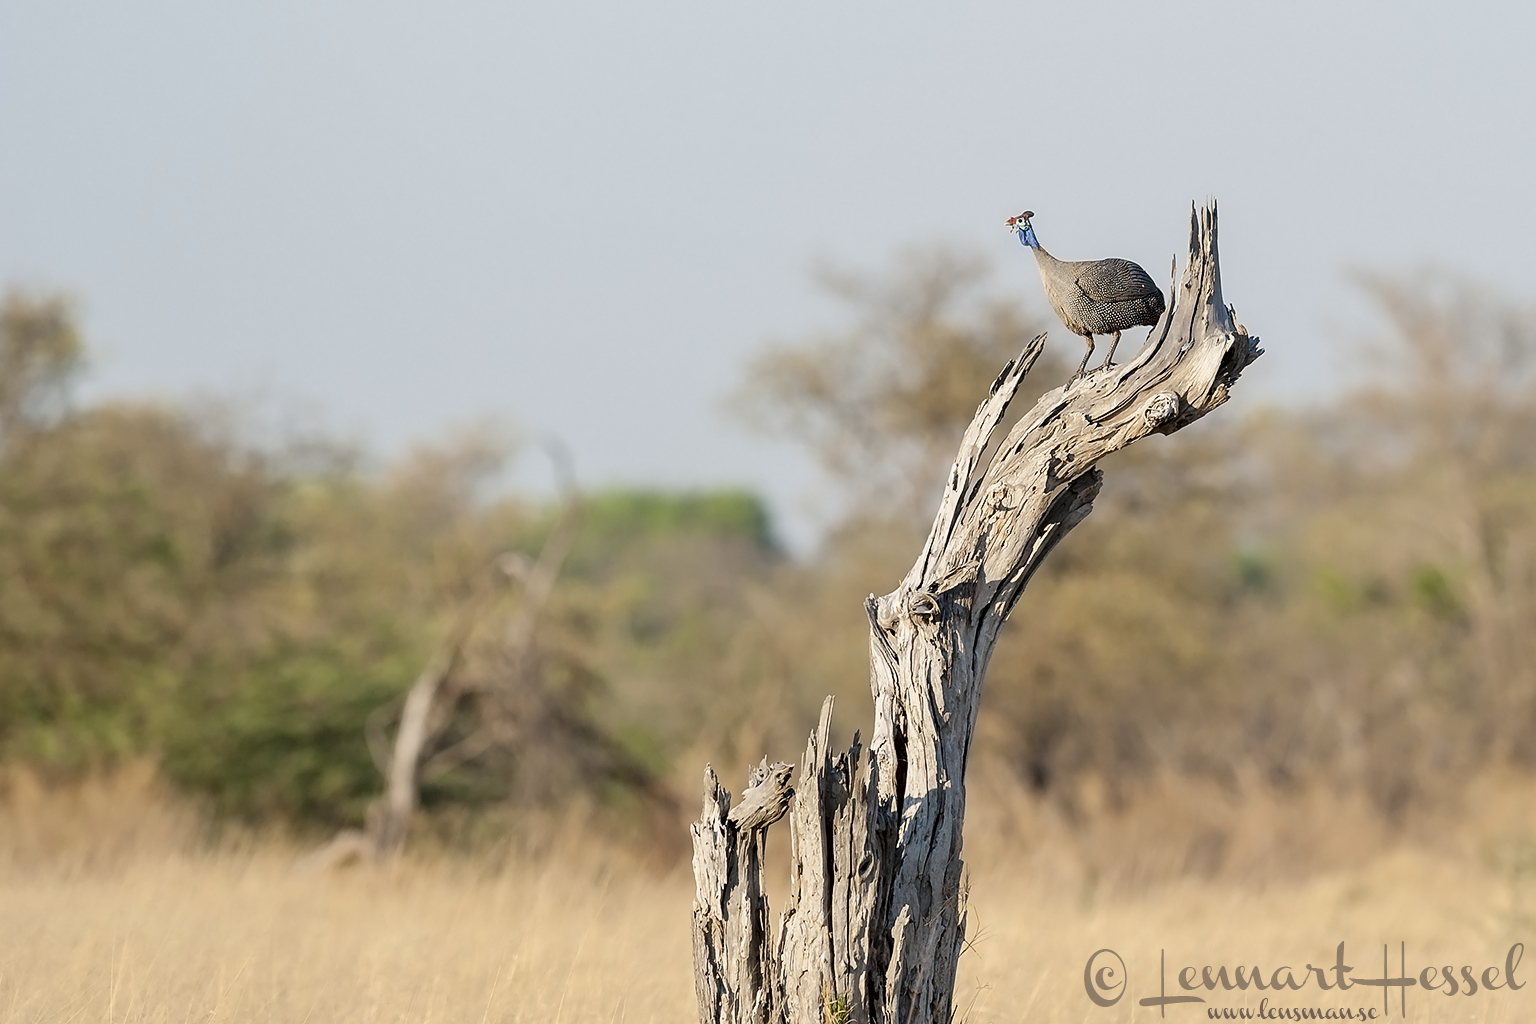 Helmeted Guineafowl in Moremi Game Reserve, Botswana